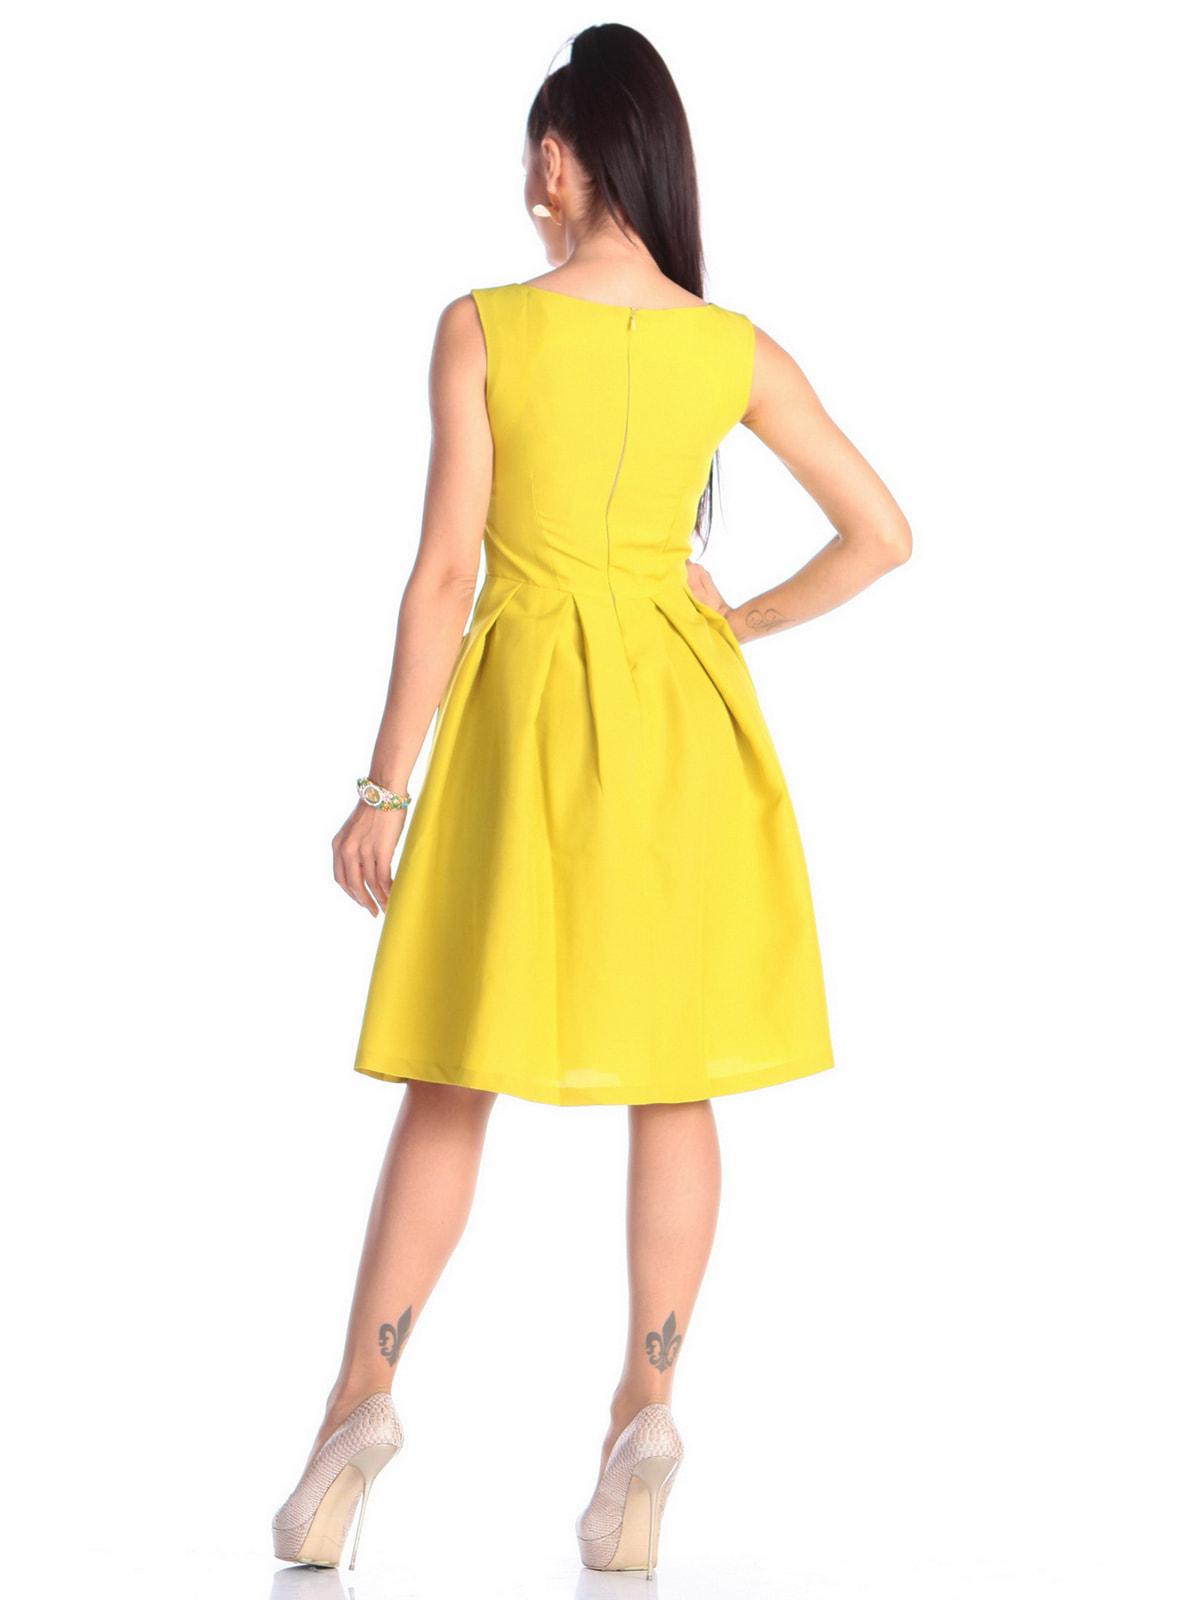 Платье желто-фисташкового цвета | 4690441 | фото 2